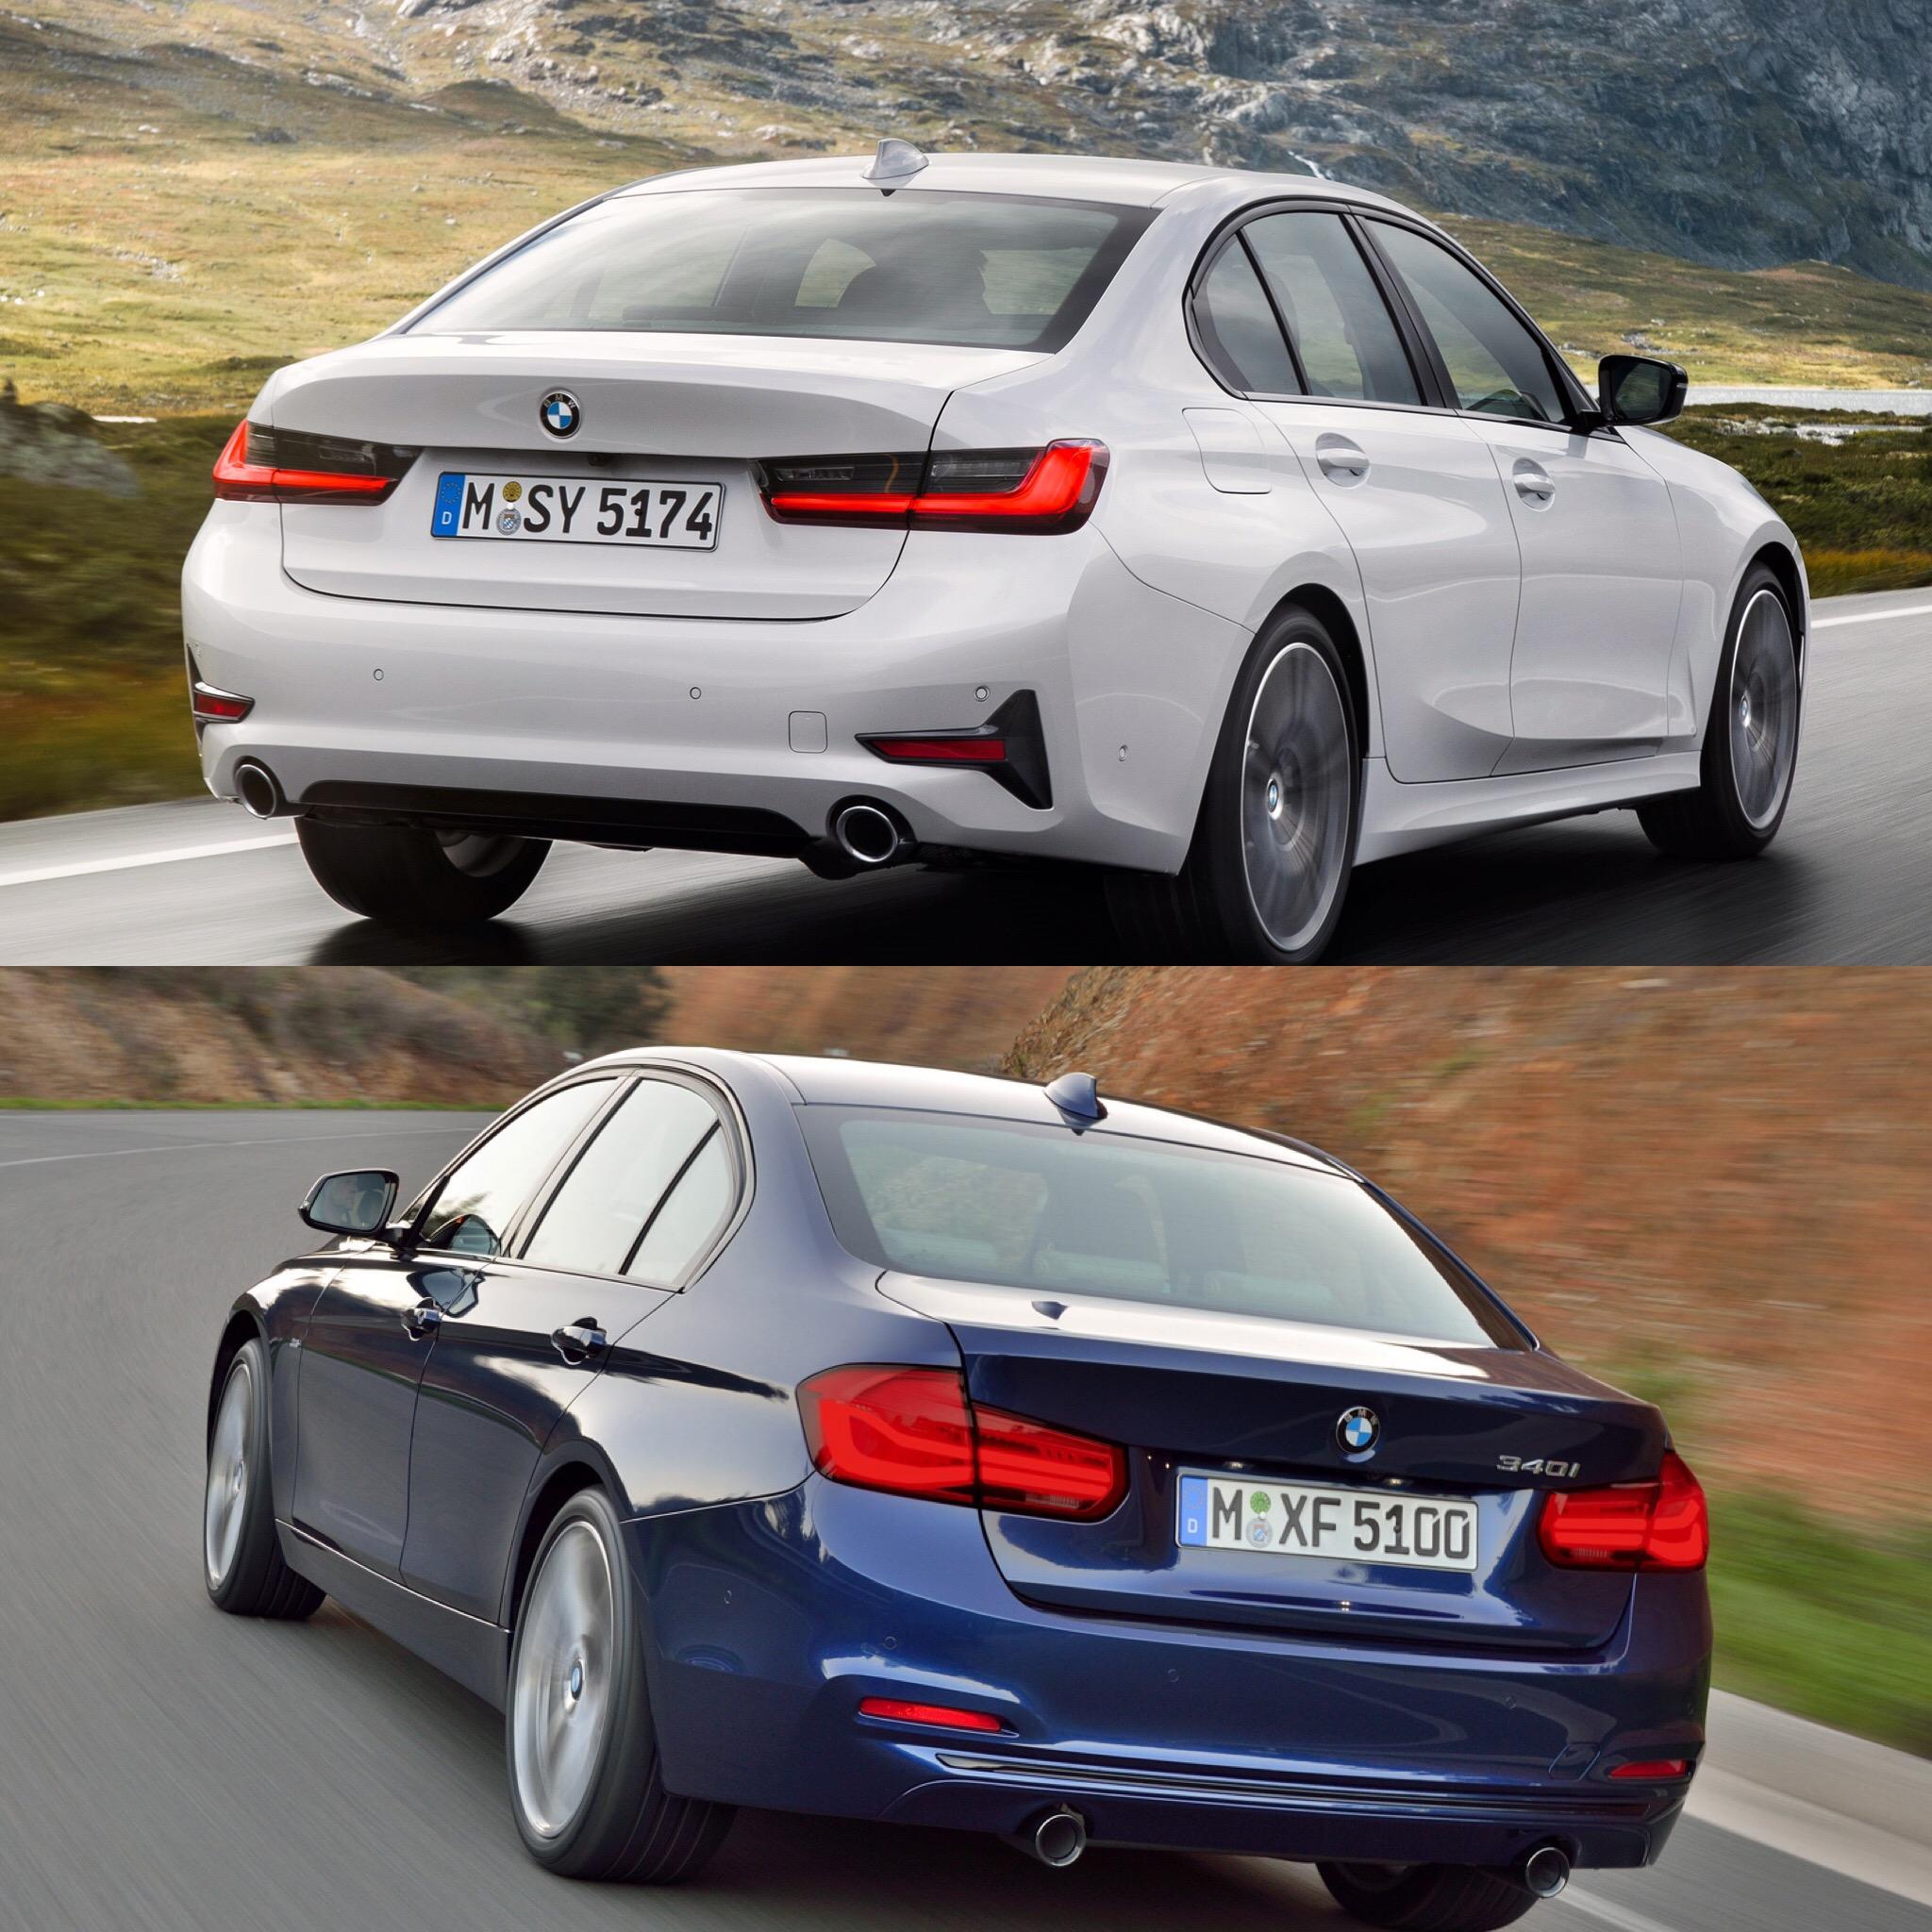 Photo Comparison G20 Bmw 3 Series Vs F30 Bmw 3 Series I New Cars